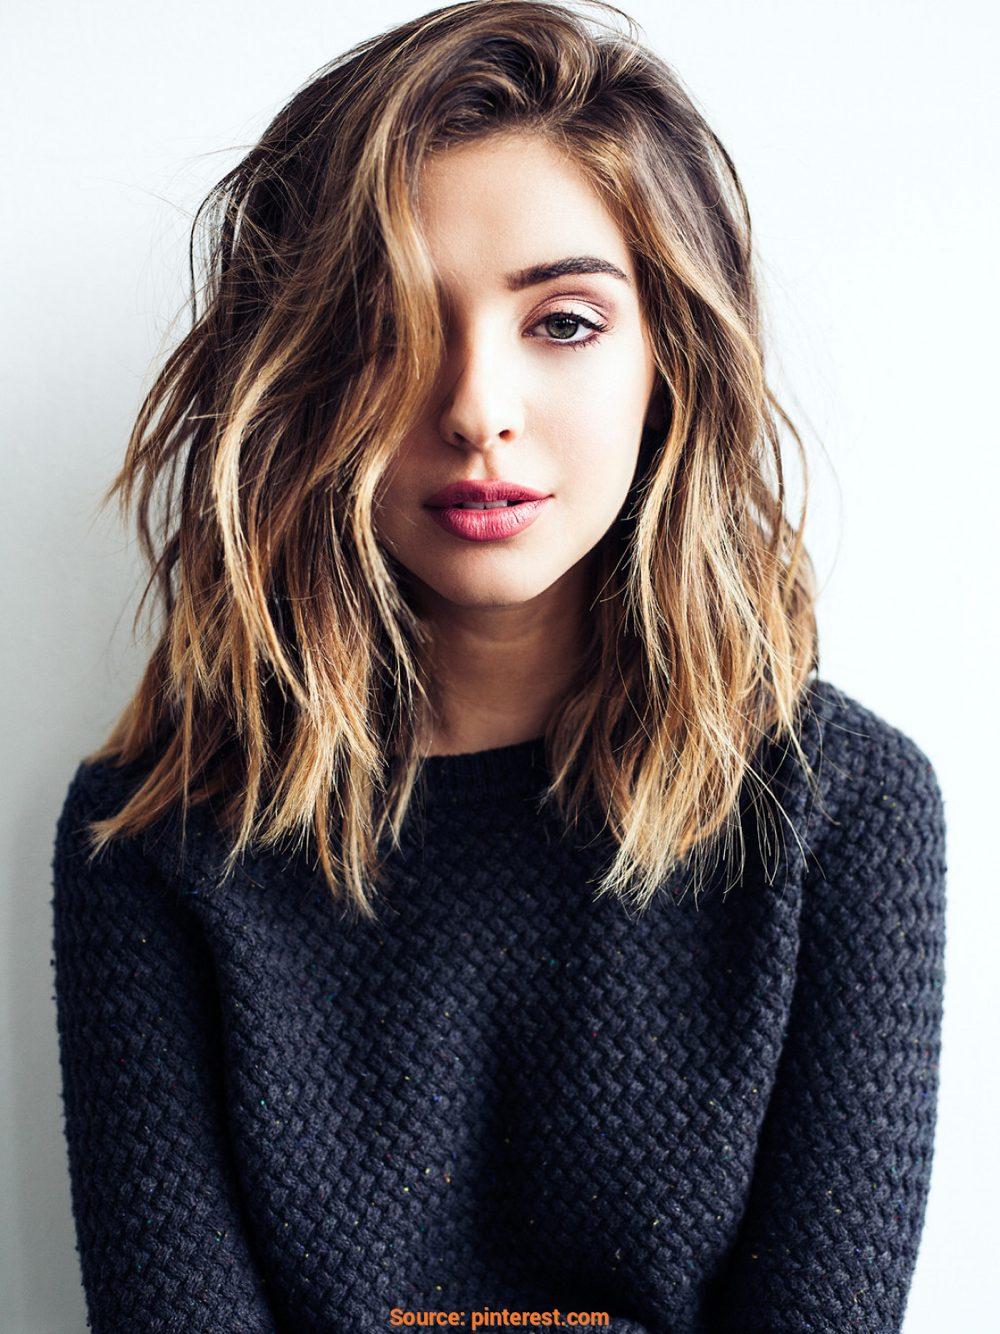 115 Top Shoulder Length Hair Ideas